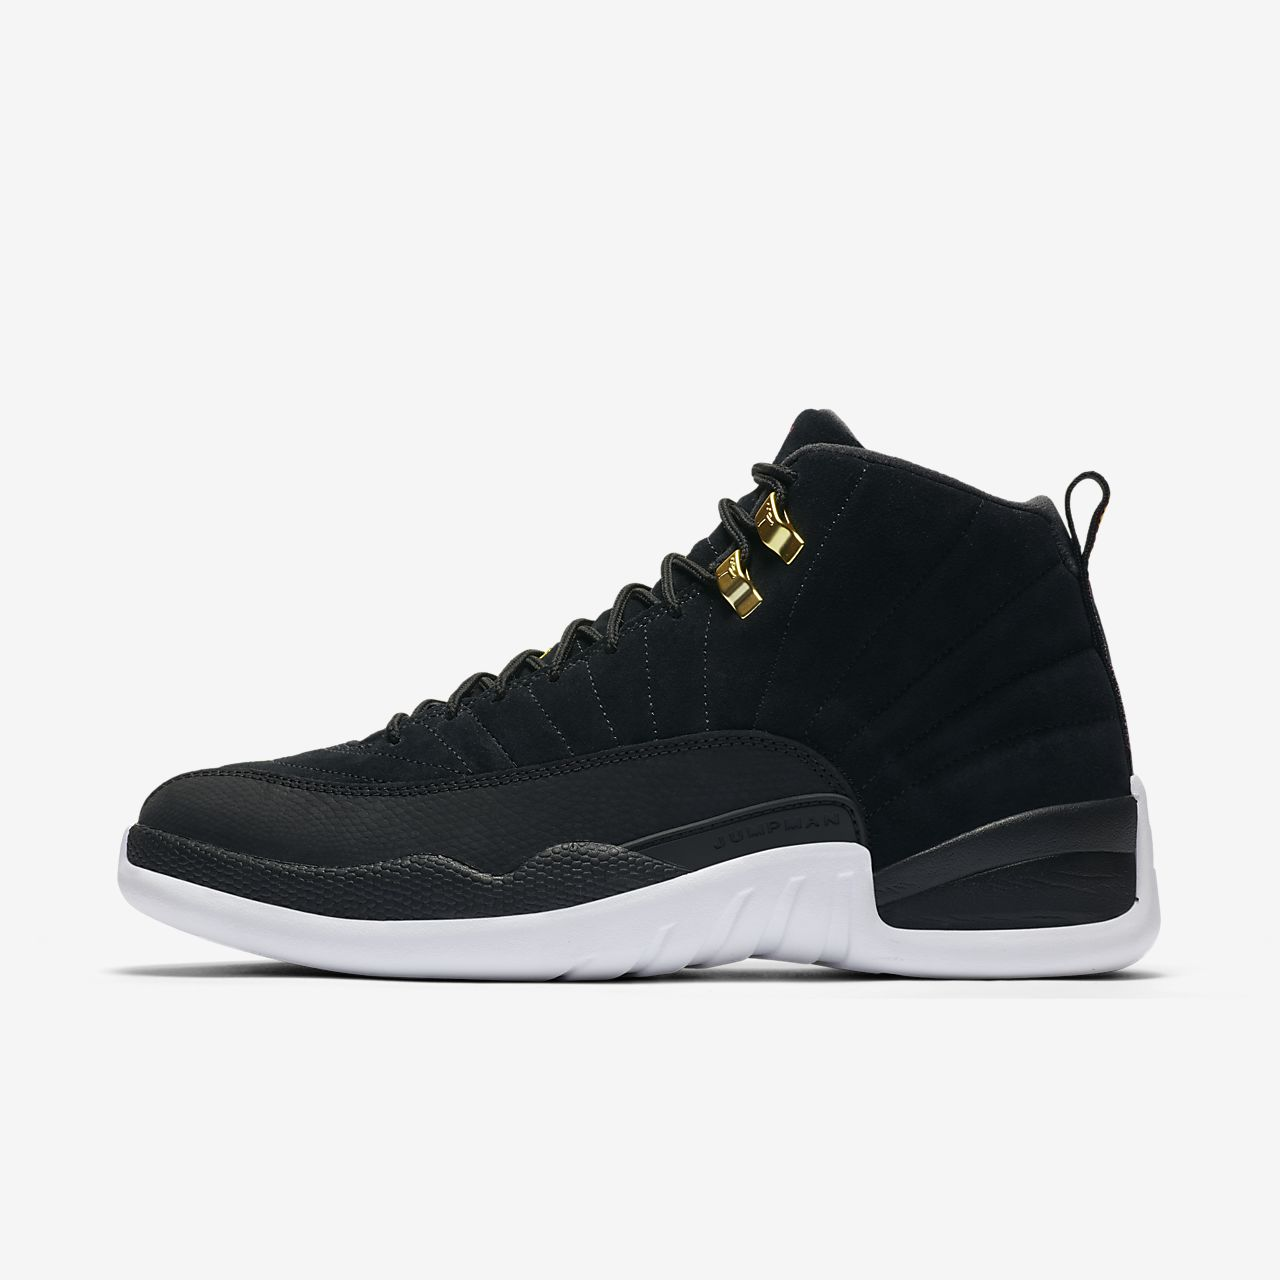 store 50% off save up to 80% Air Jordan 12 Retro Schuh